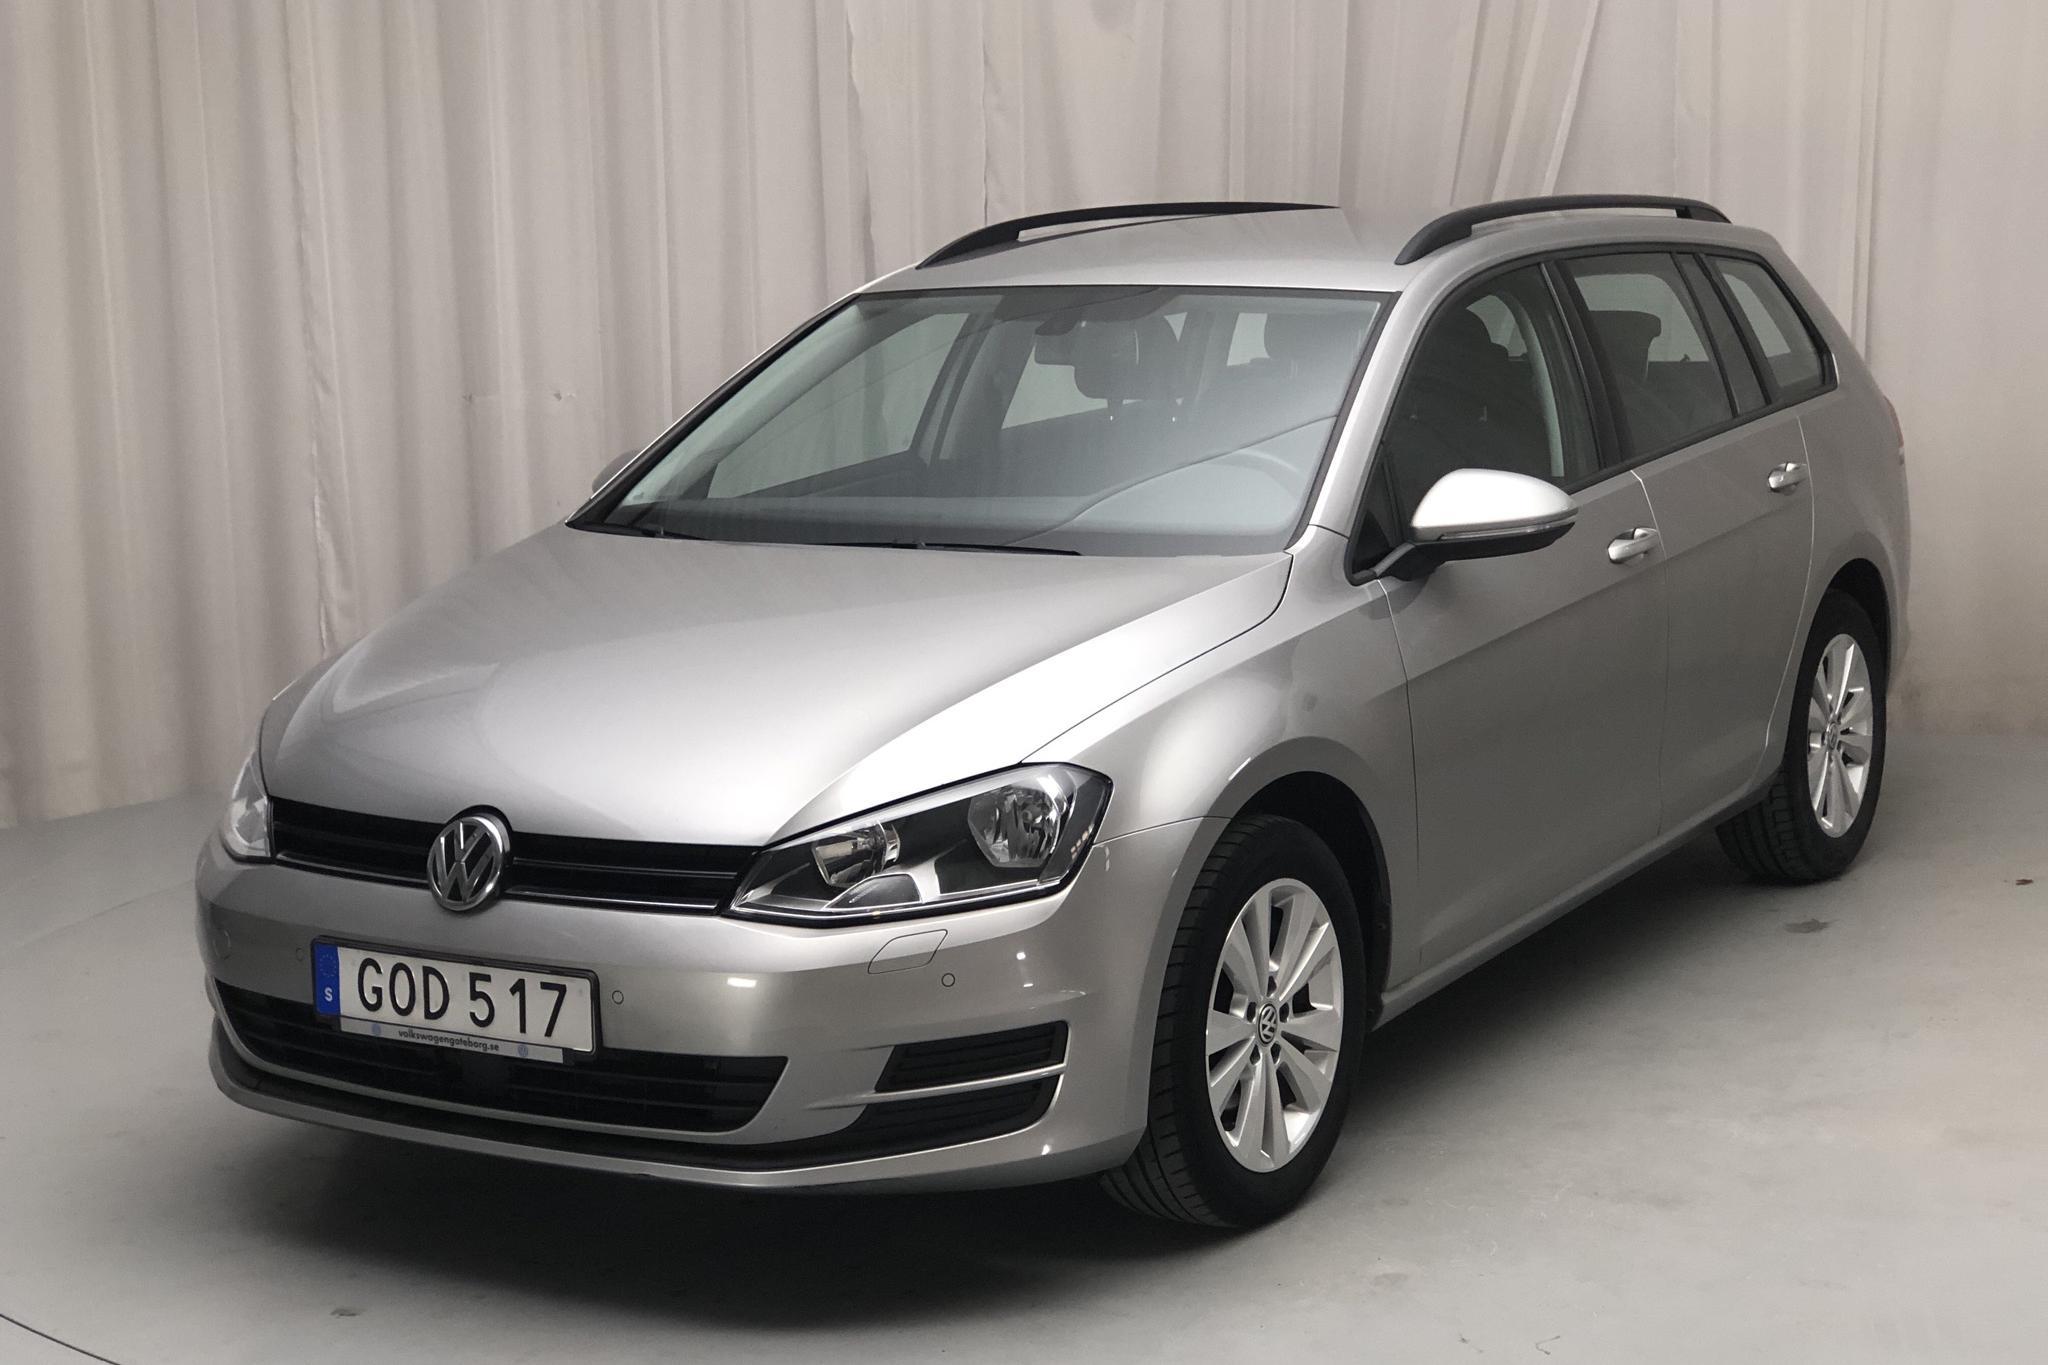 VW Golf VII 1.2 TSI Sportscombi (105hk) - 6 338 mil - Manuell - silver - 2015